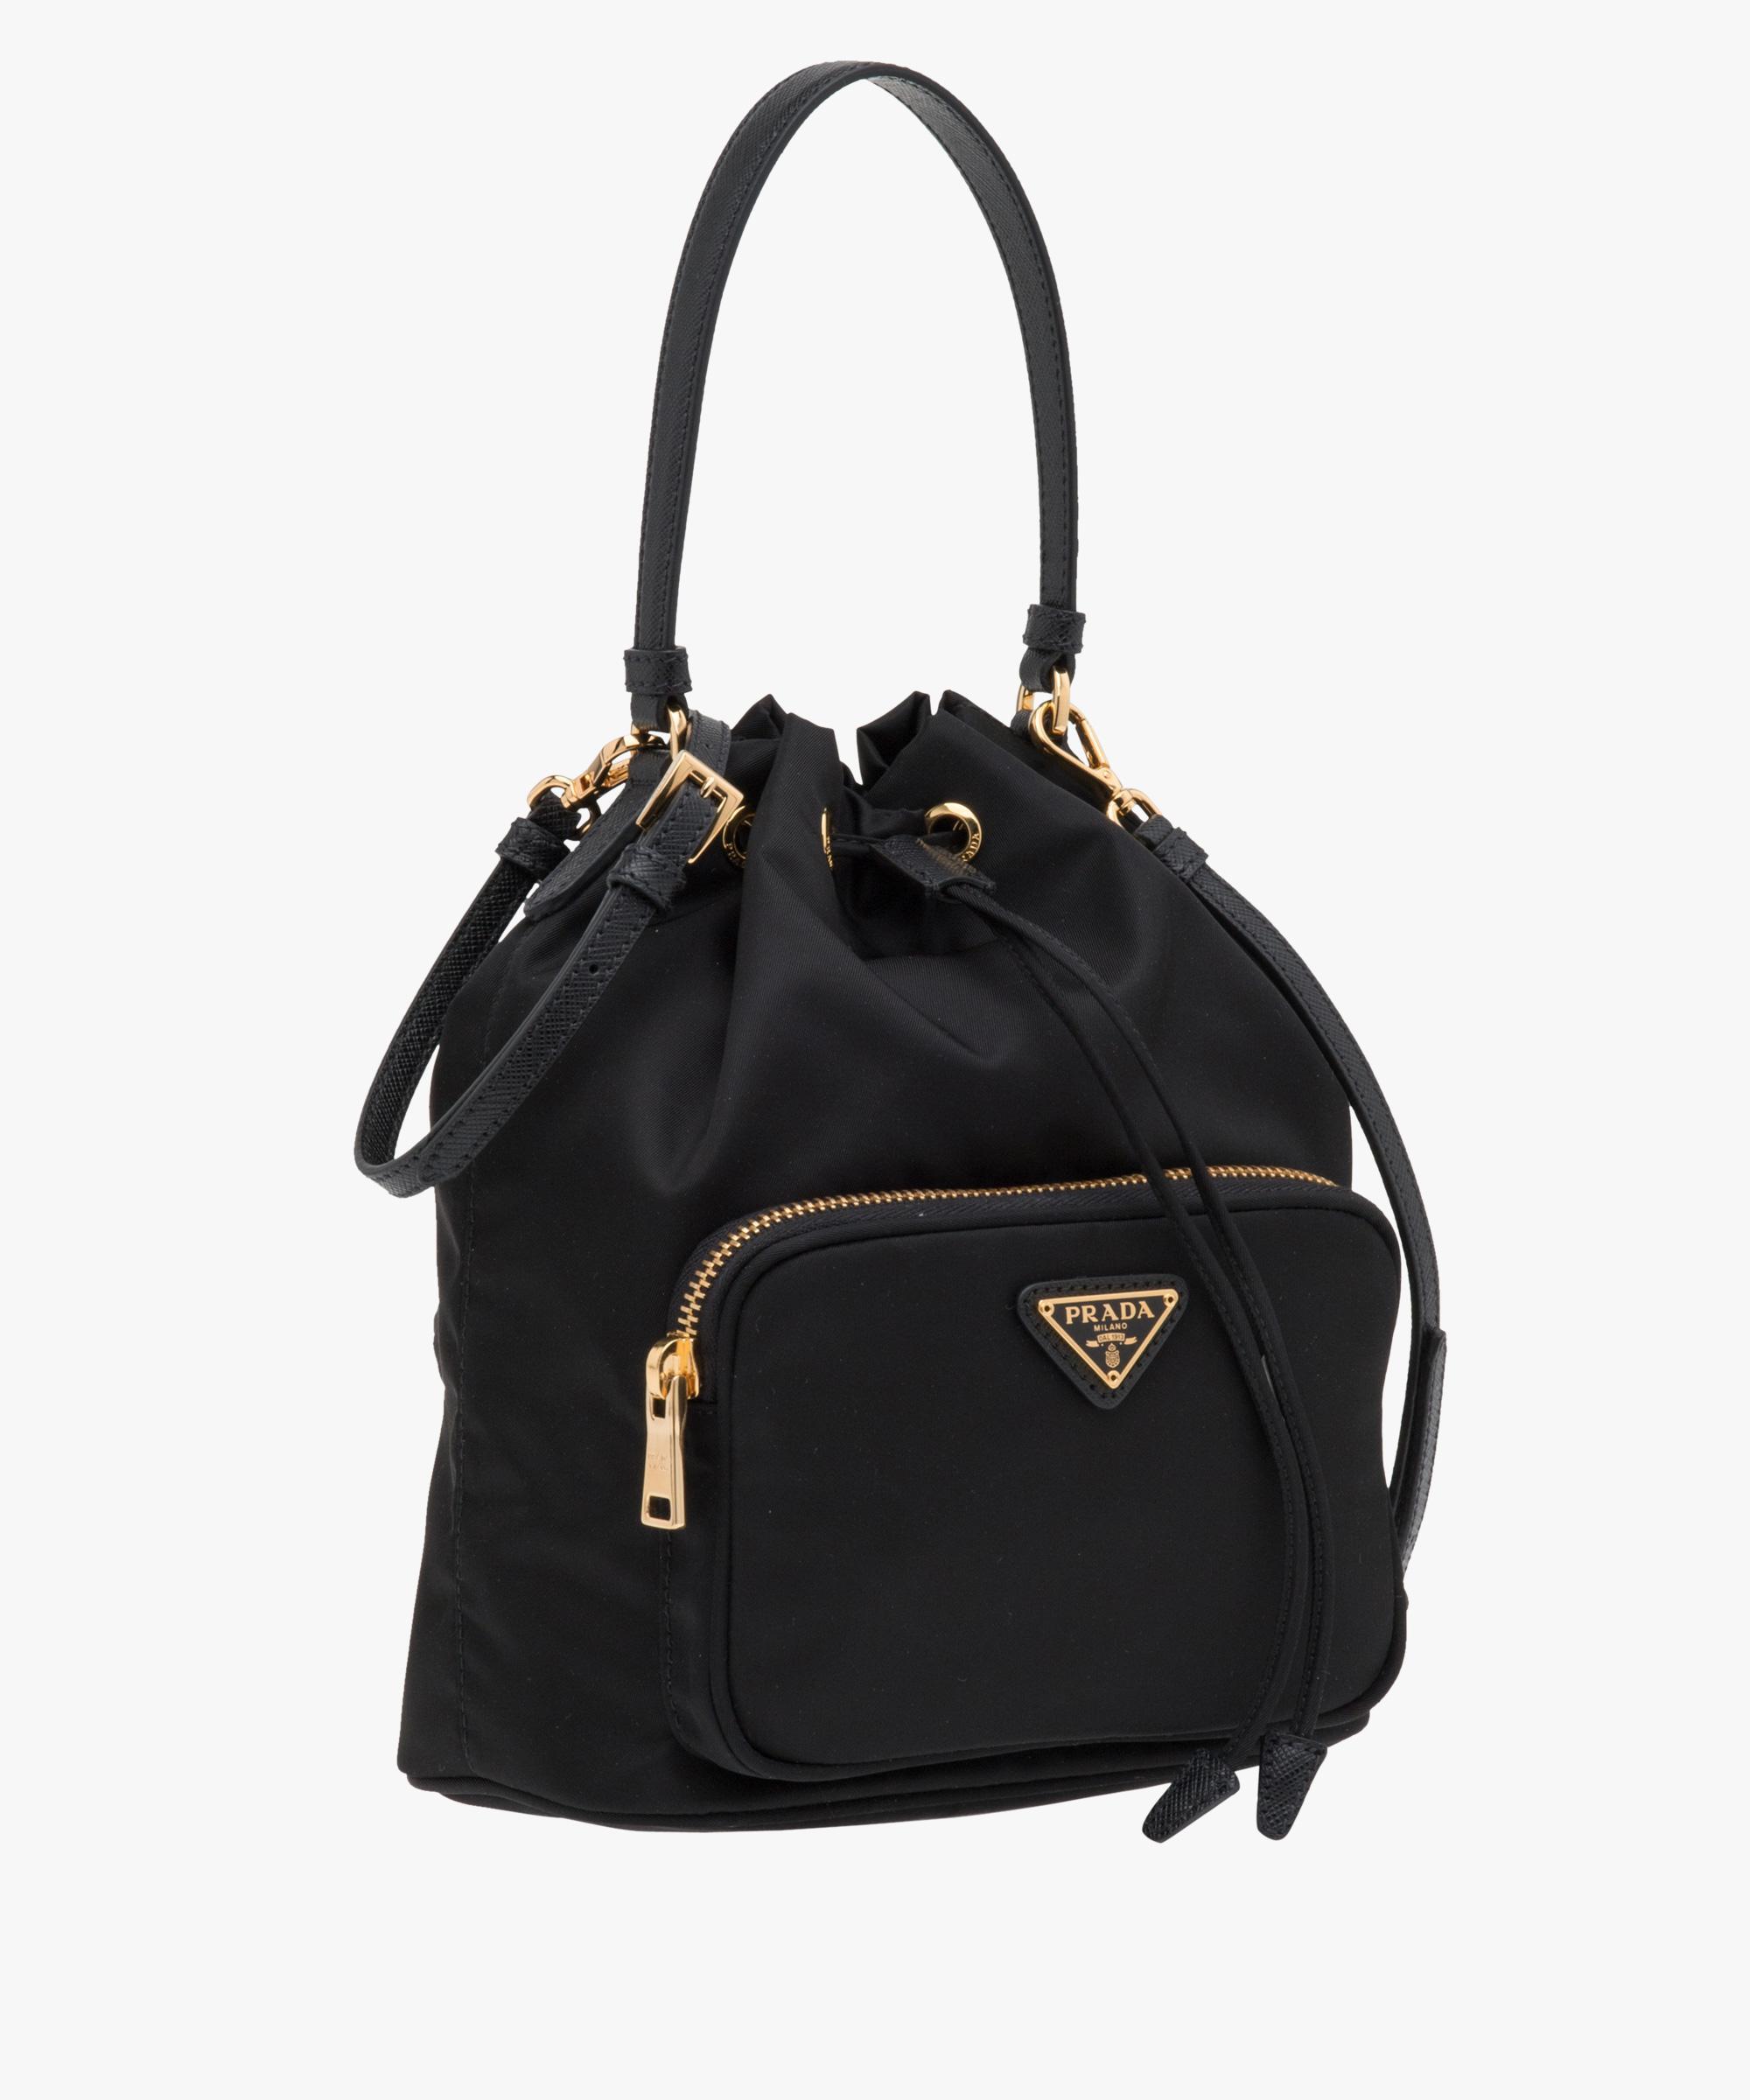 c47a2f92b1c8 ... new style lyst prada fabric mini bag in black 9cca7 df758 ...